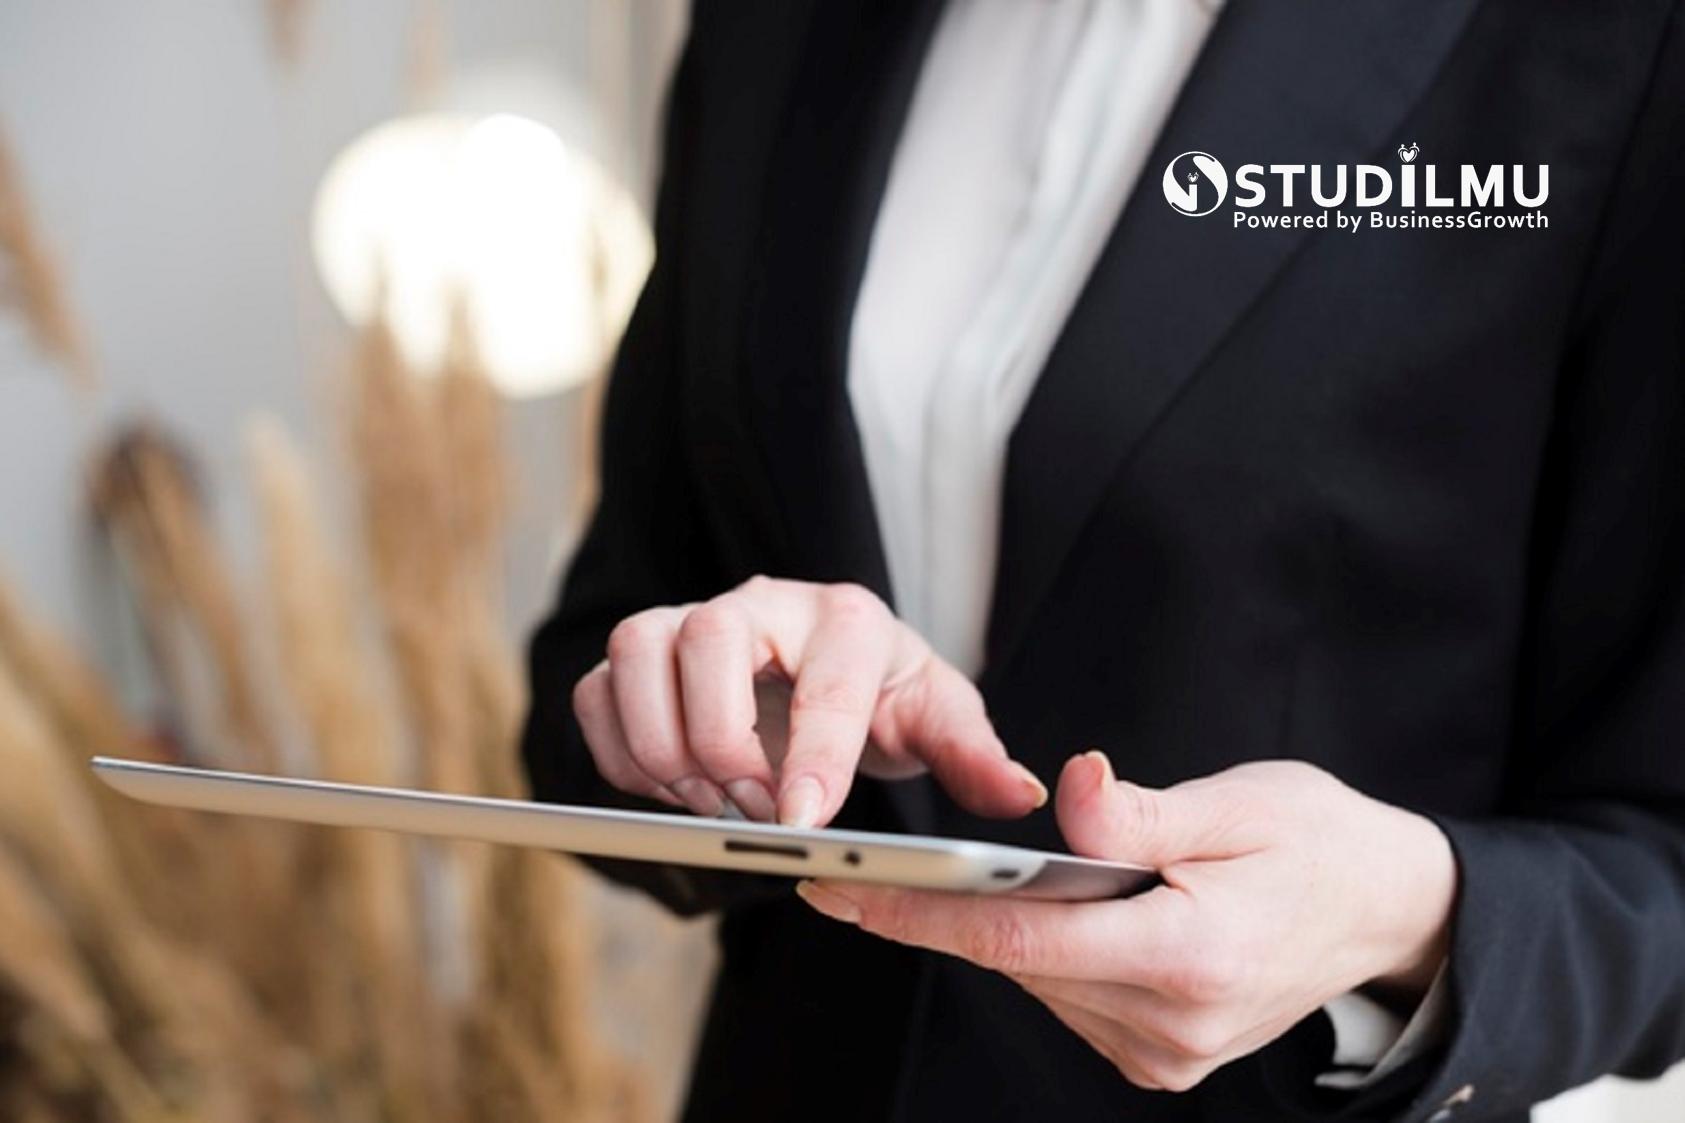 STUDILMU Career Advice - 3 Cara Mempertahankan Hubungan Profesional